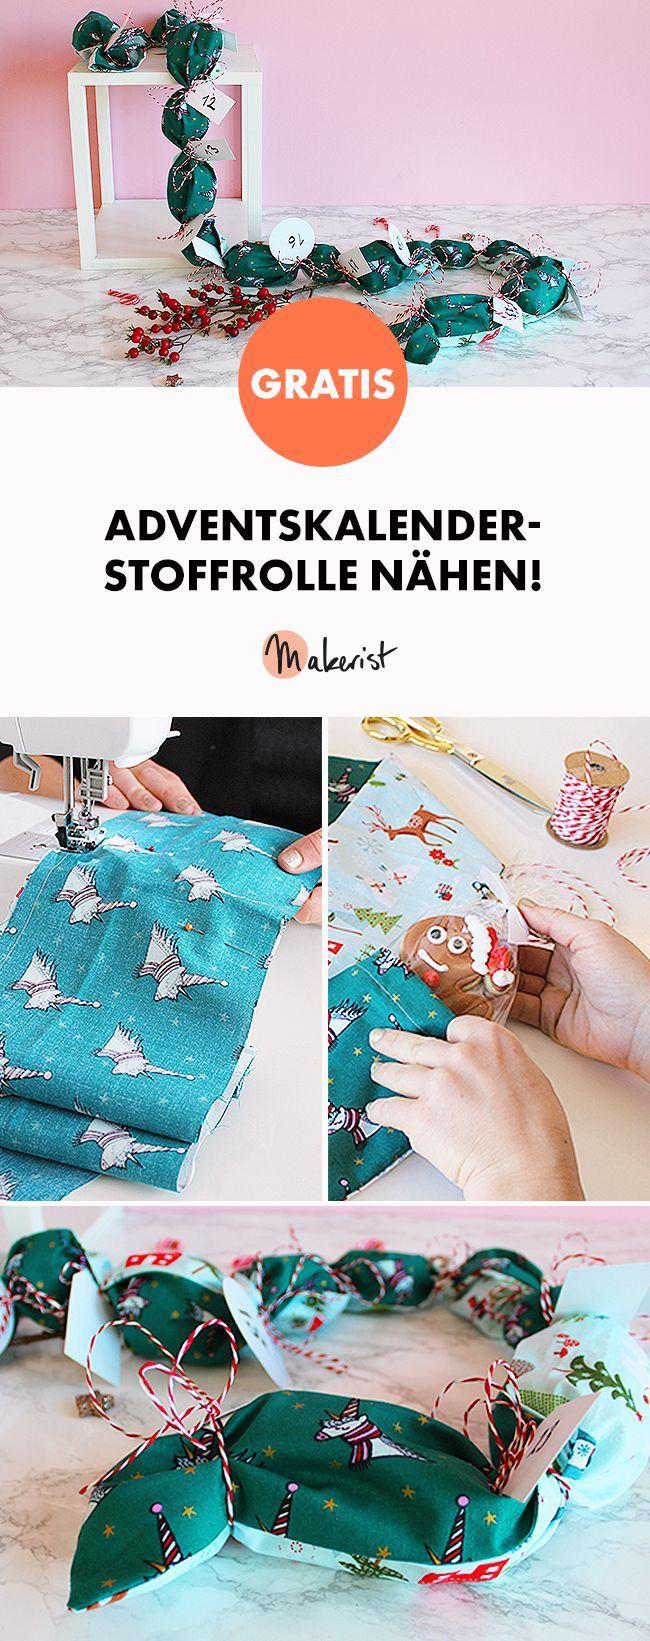 Adventskaender-Stoffrolle nähen - kostenlose Nähanleitung via Makerist.de